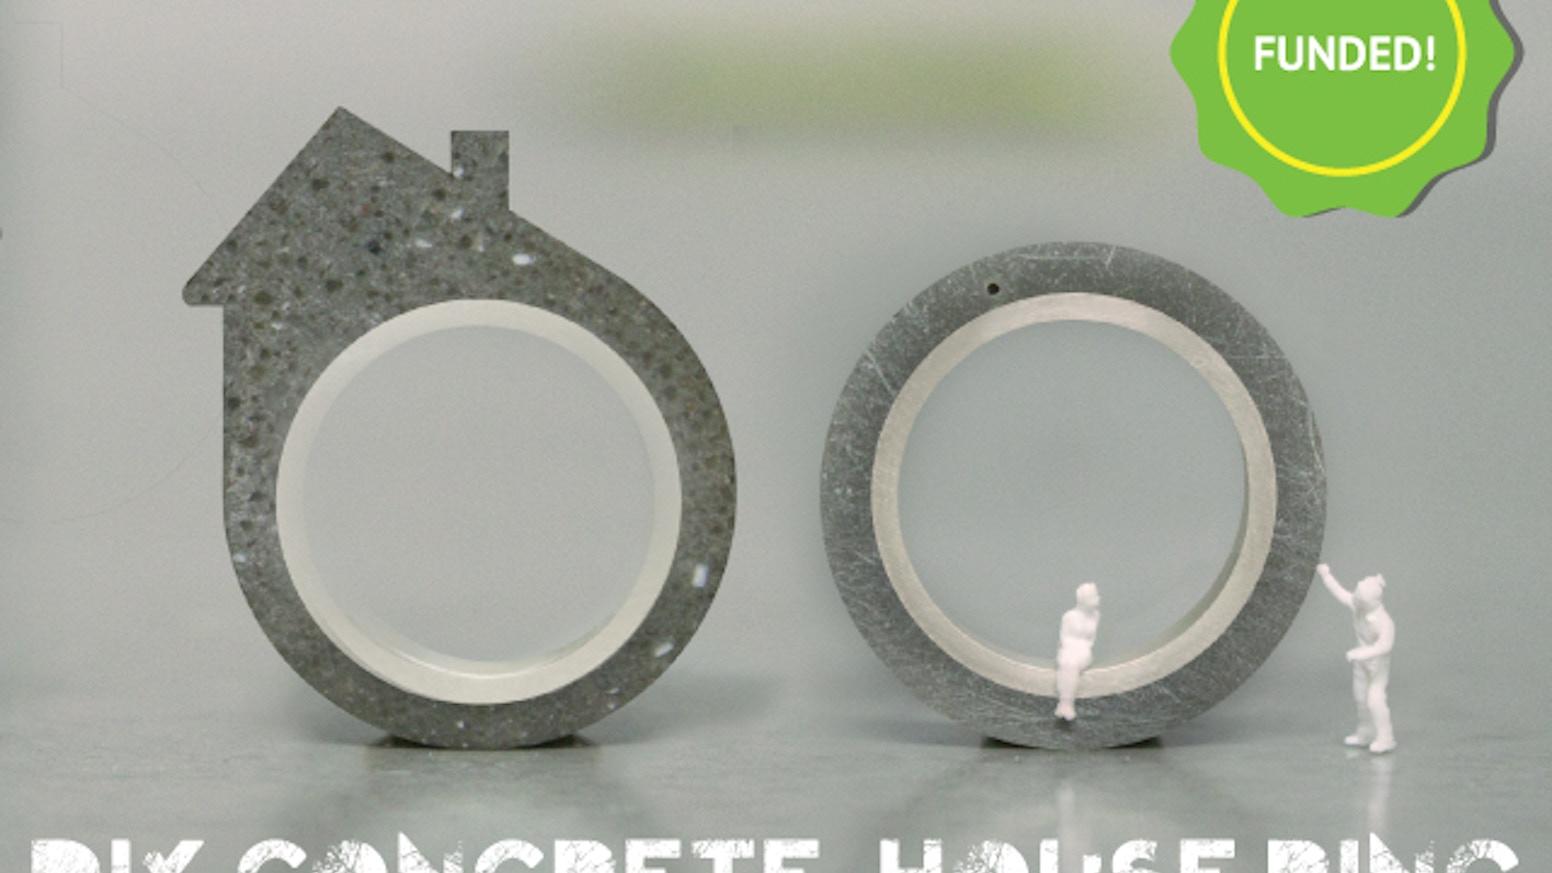 Crayon Rings The Diy Concrete House Ring By Linda Bennett Kickstarter